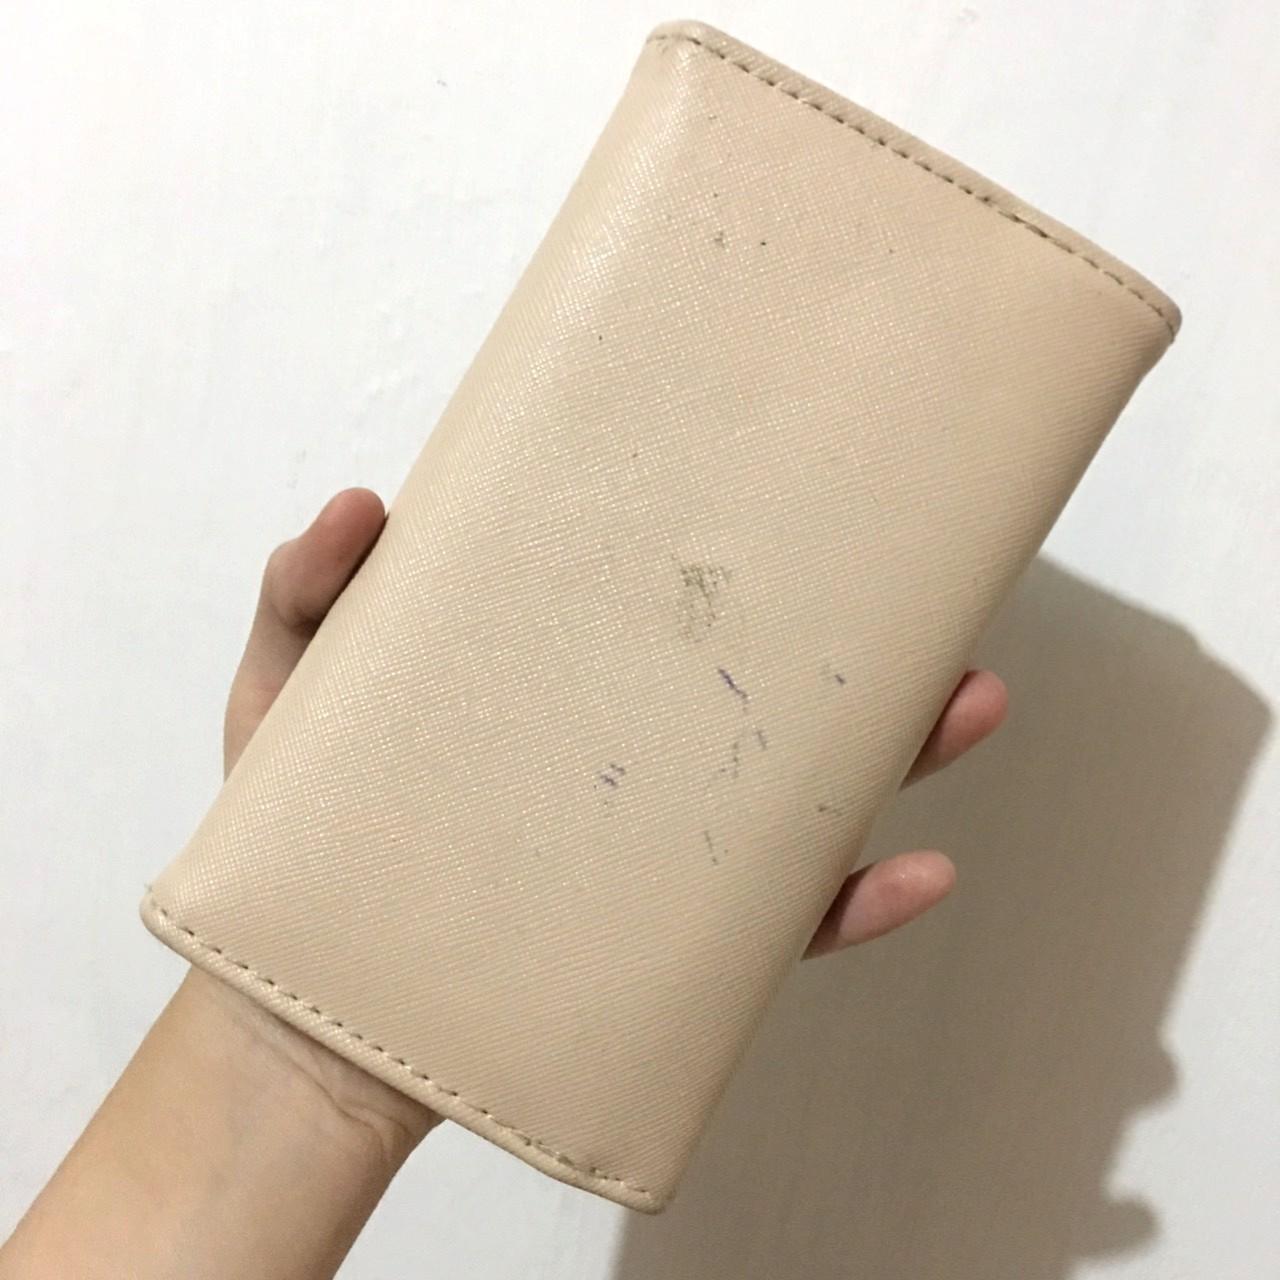 Newlook nude wallet